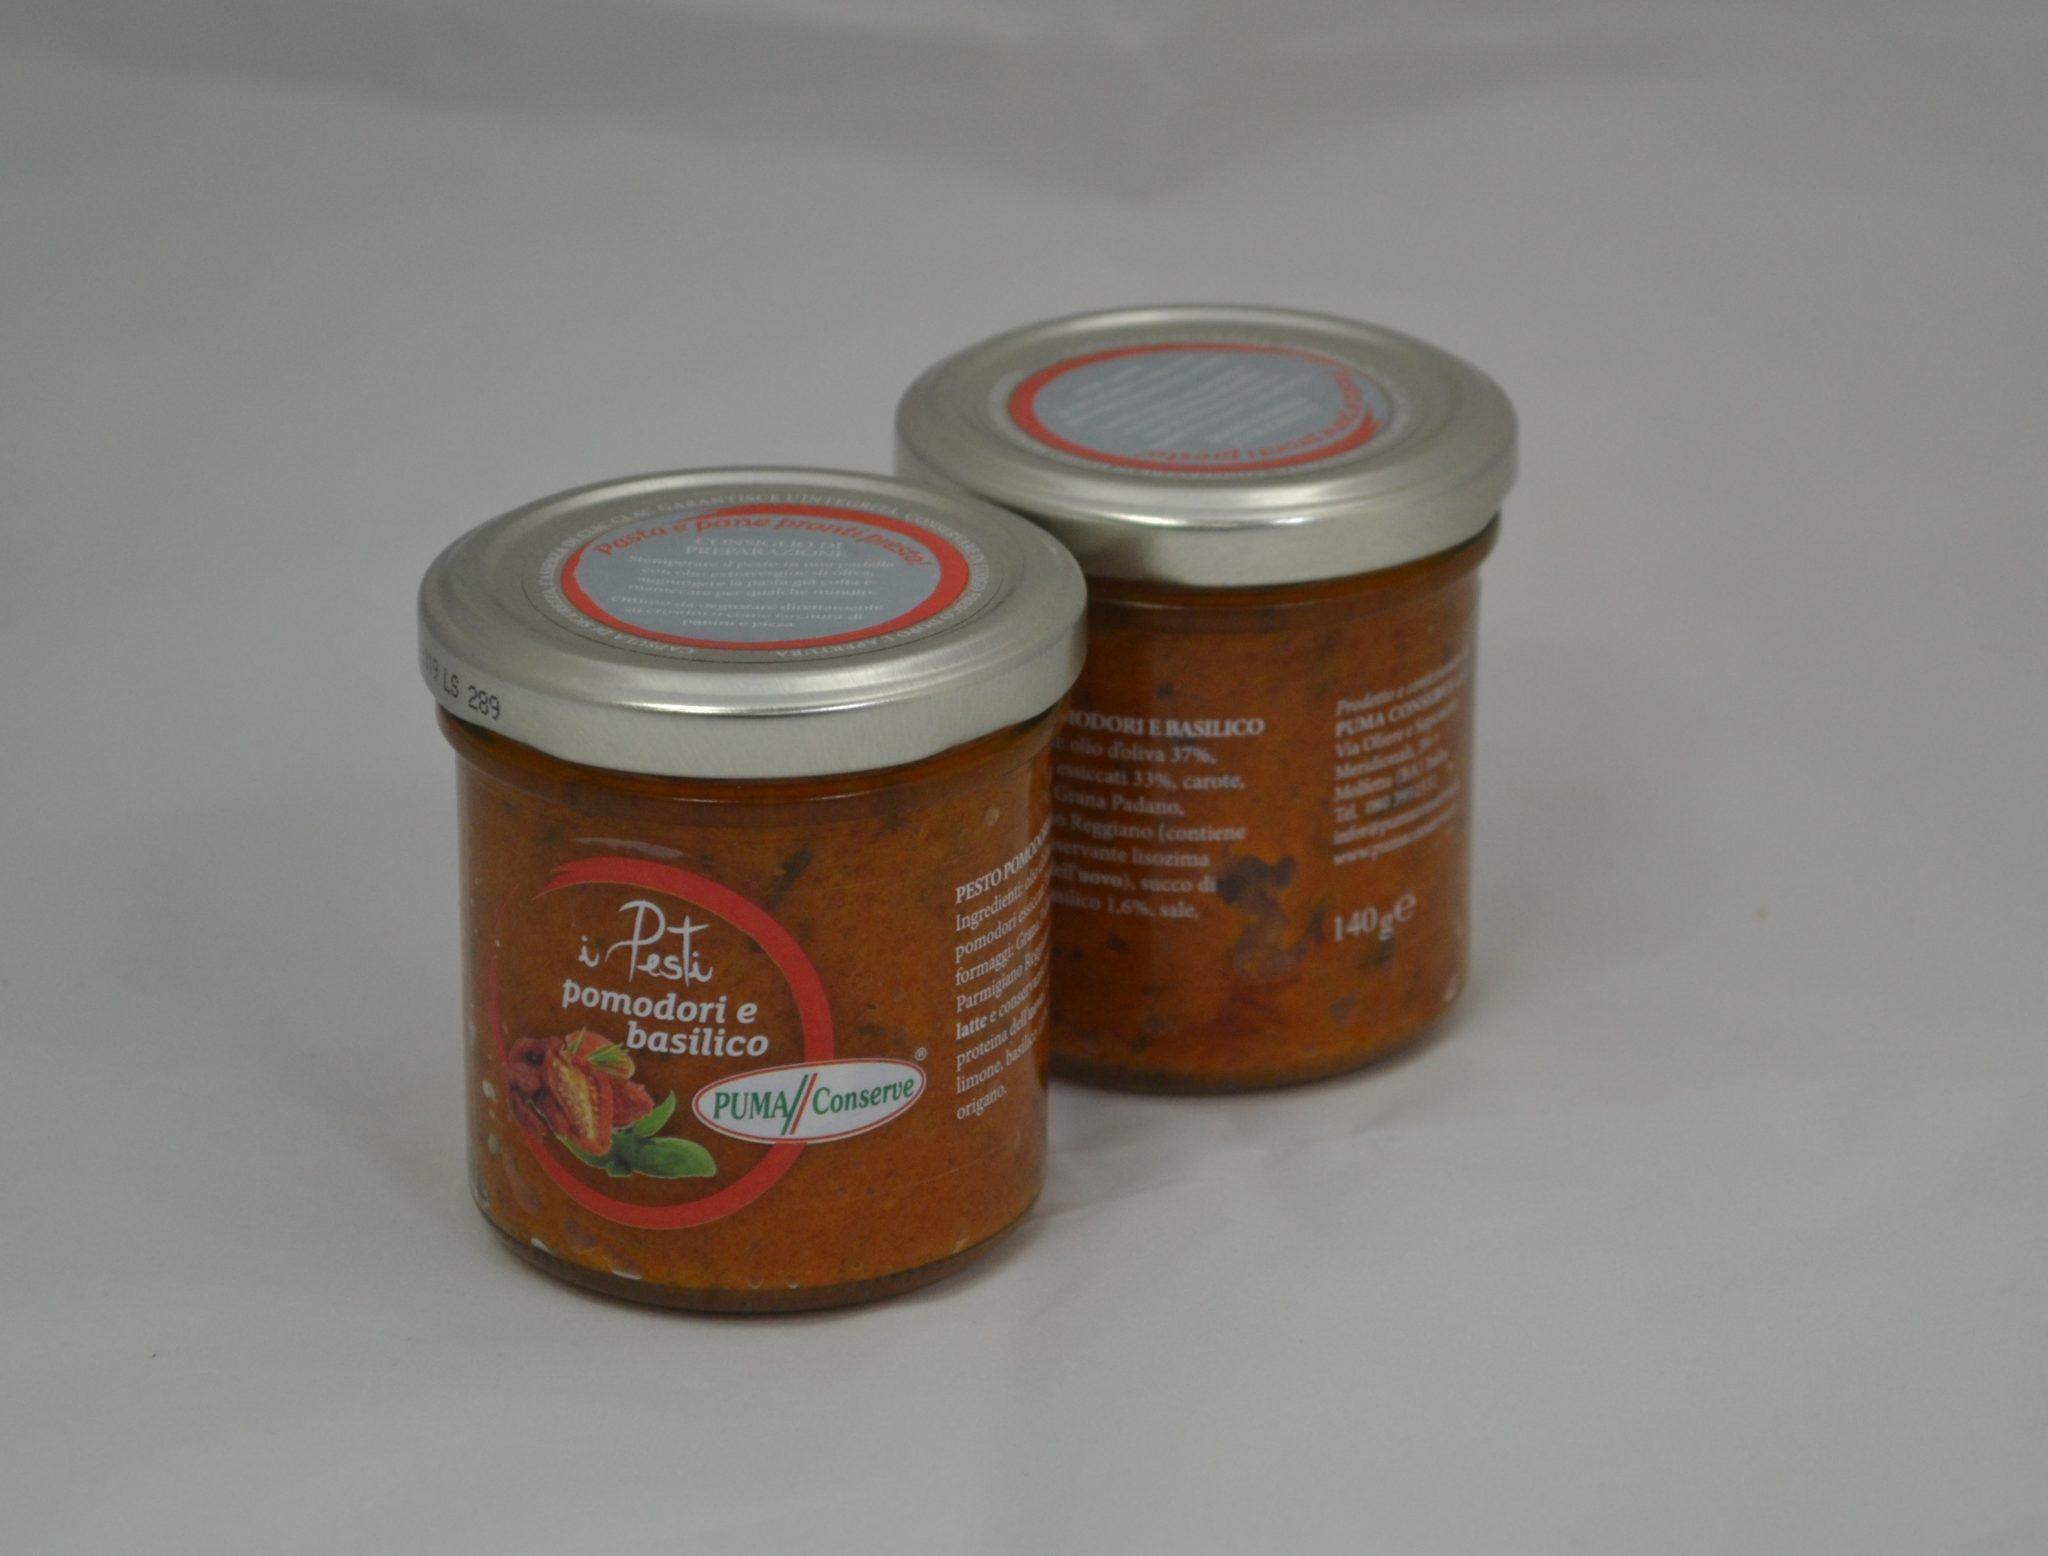 i Pesti pomodoro e basilico